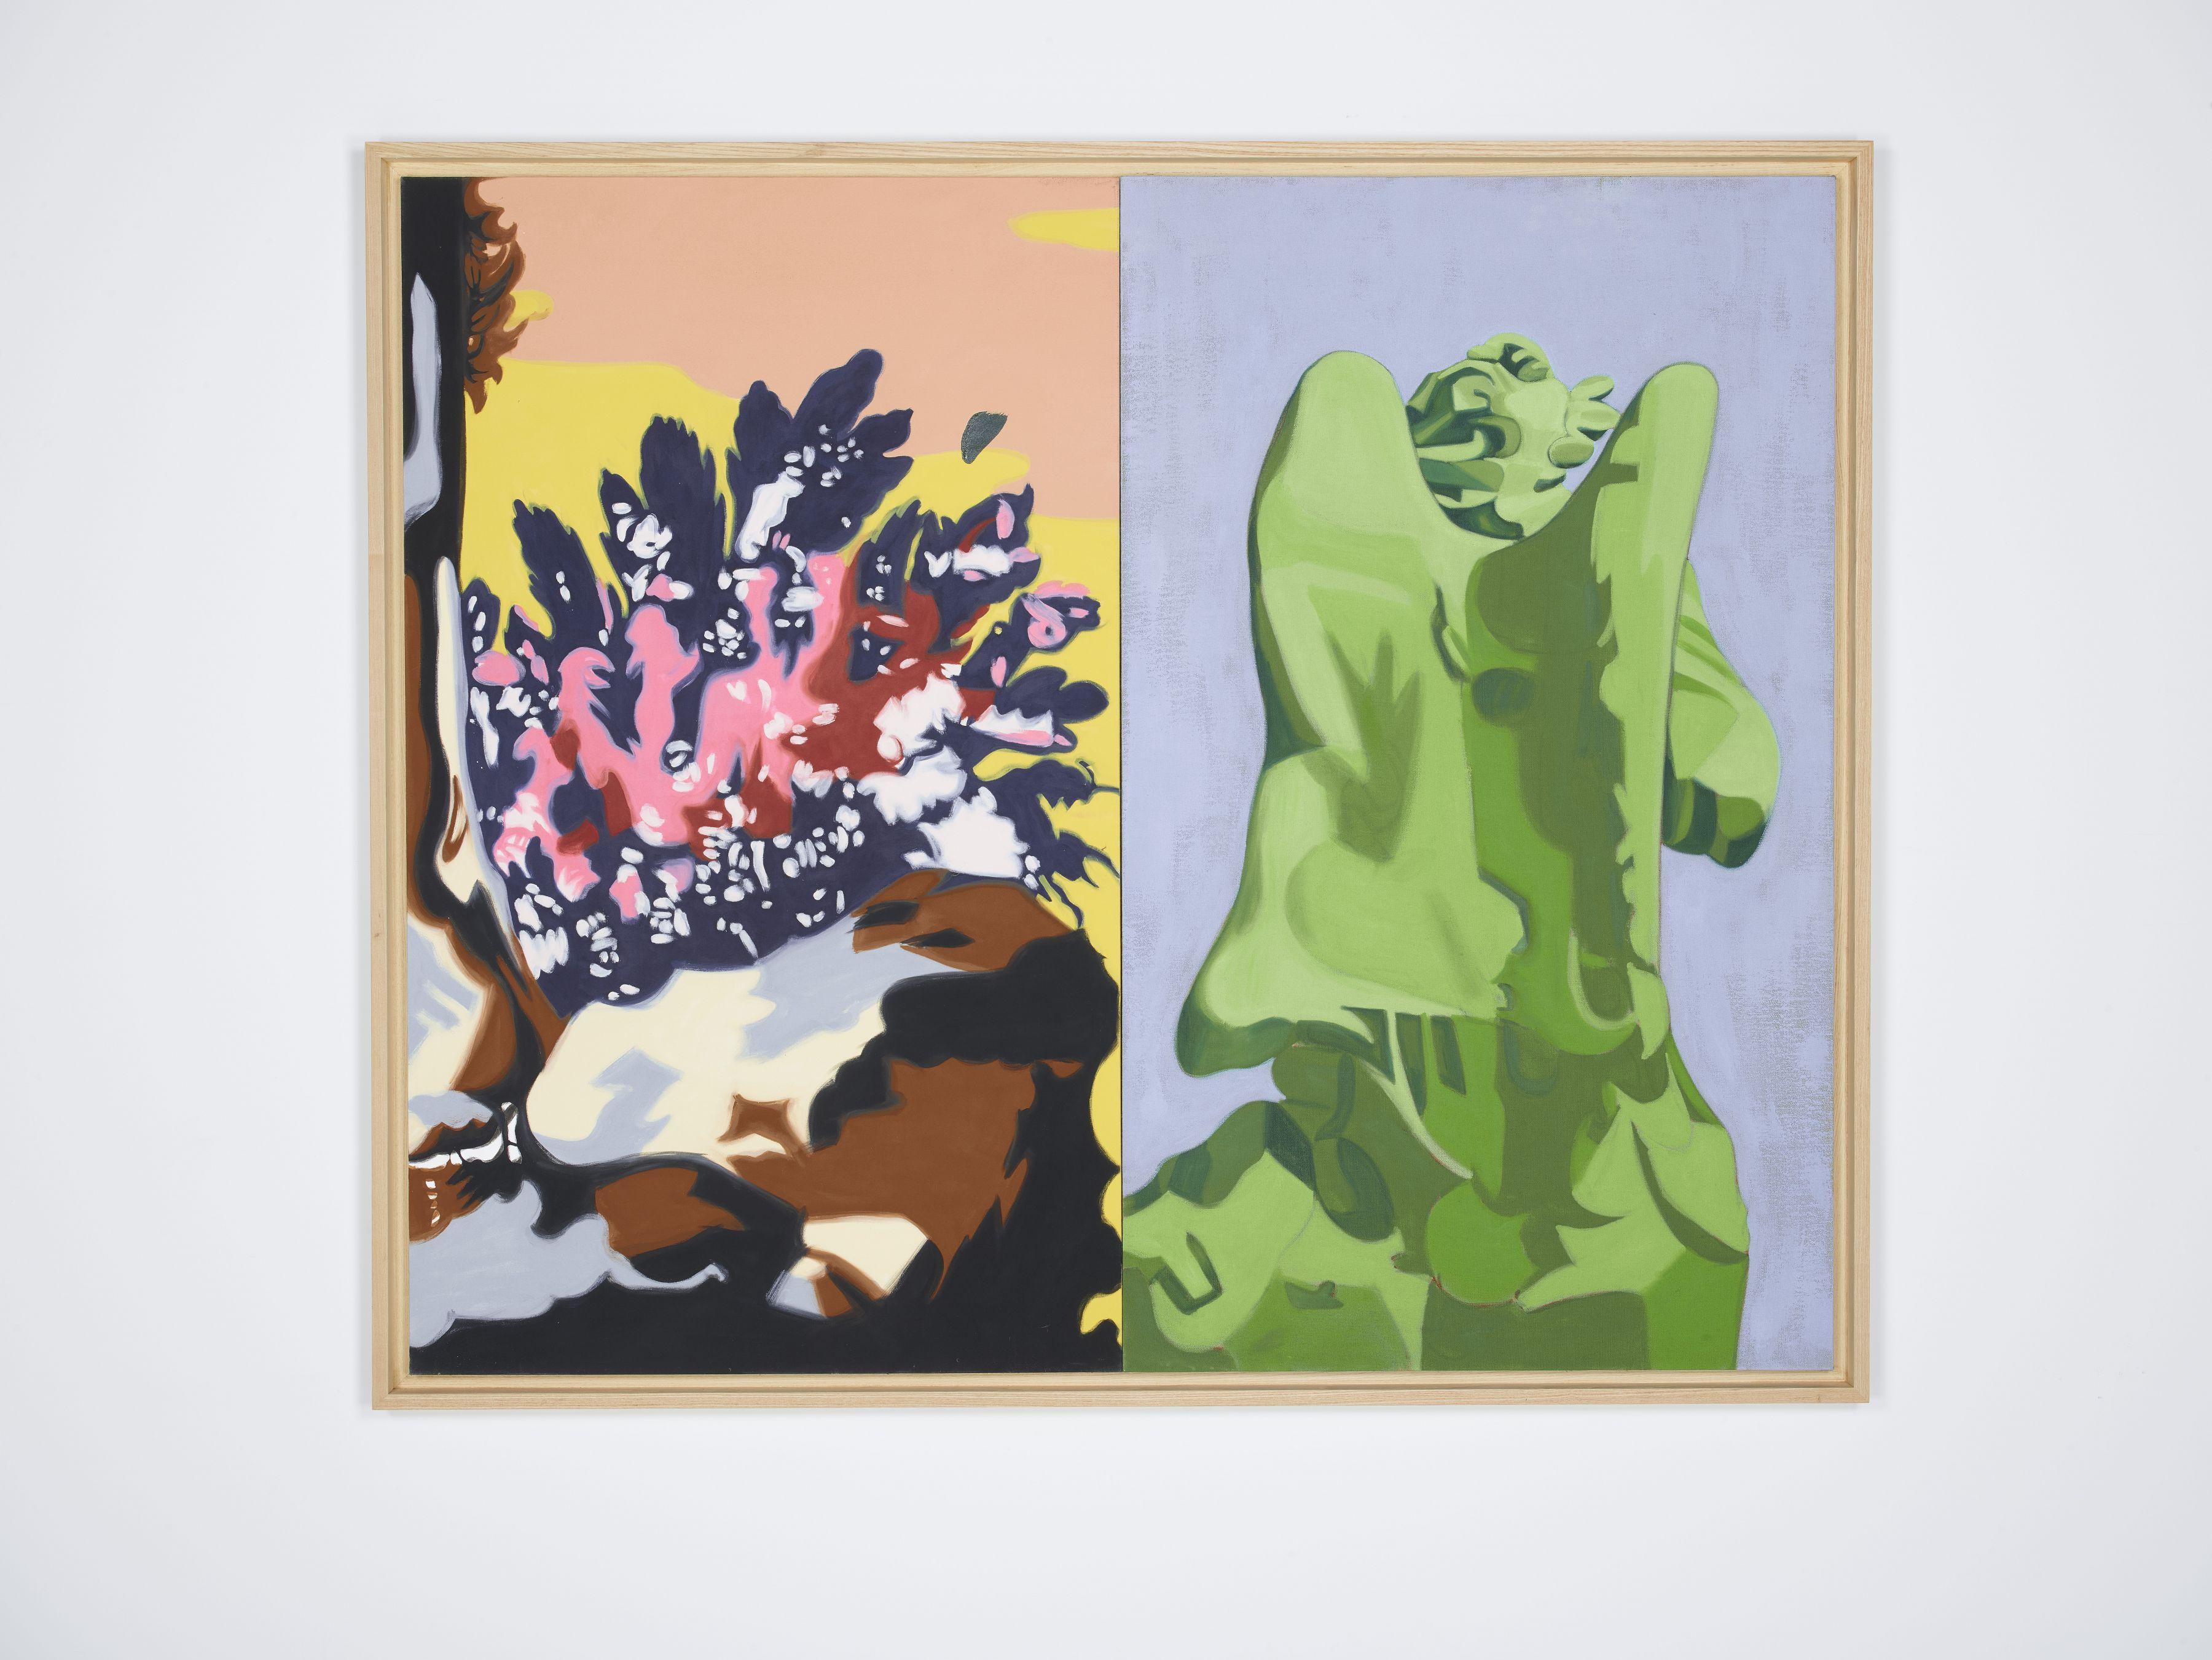 DAVID SALLE Green Angel, 2001